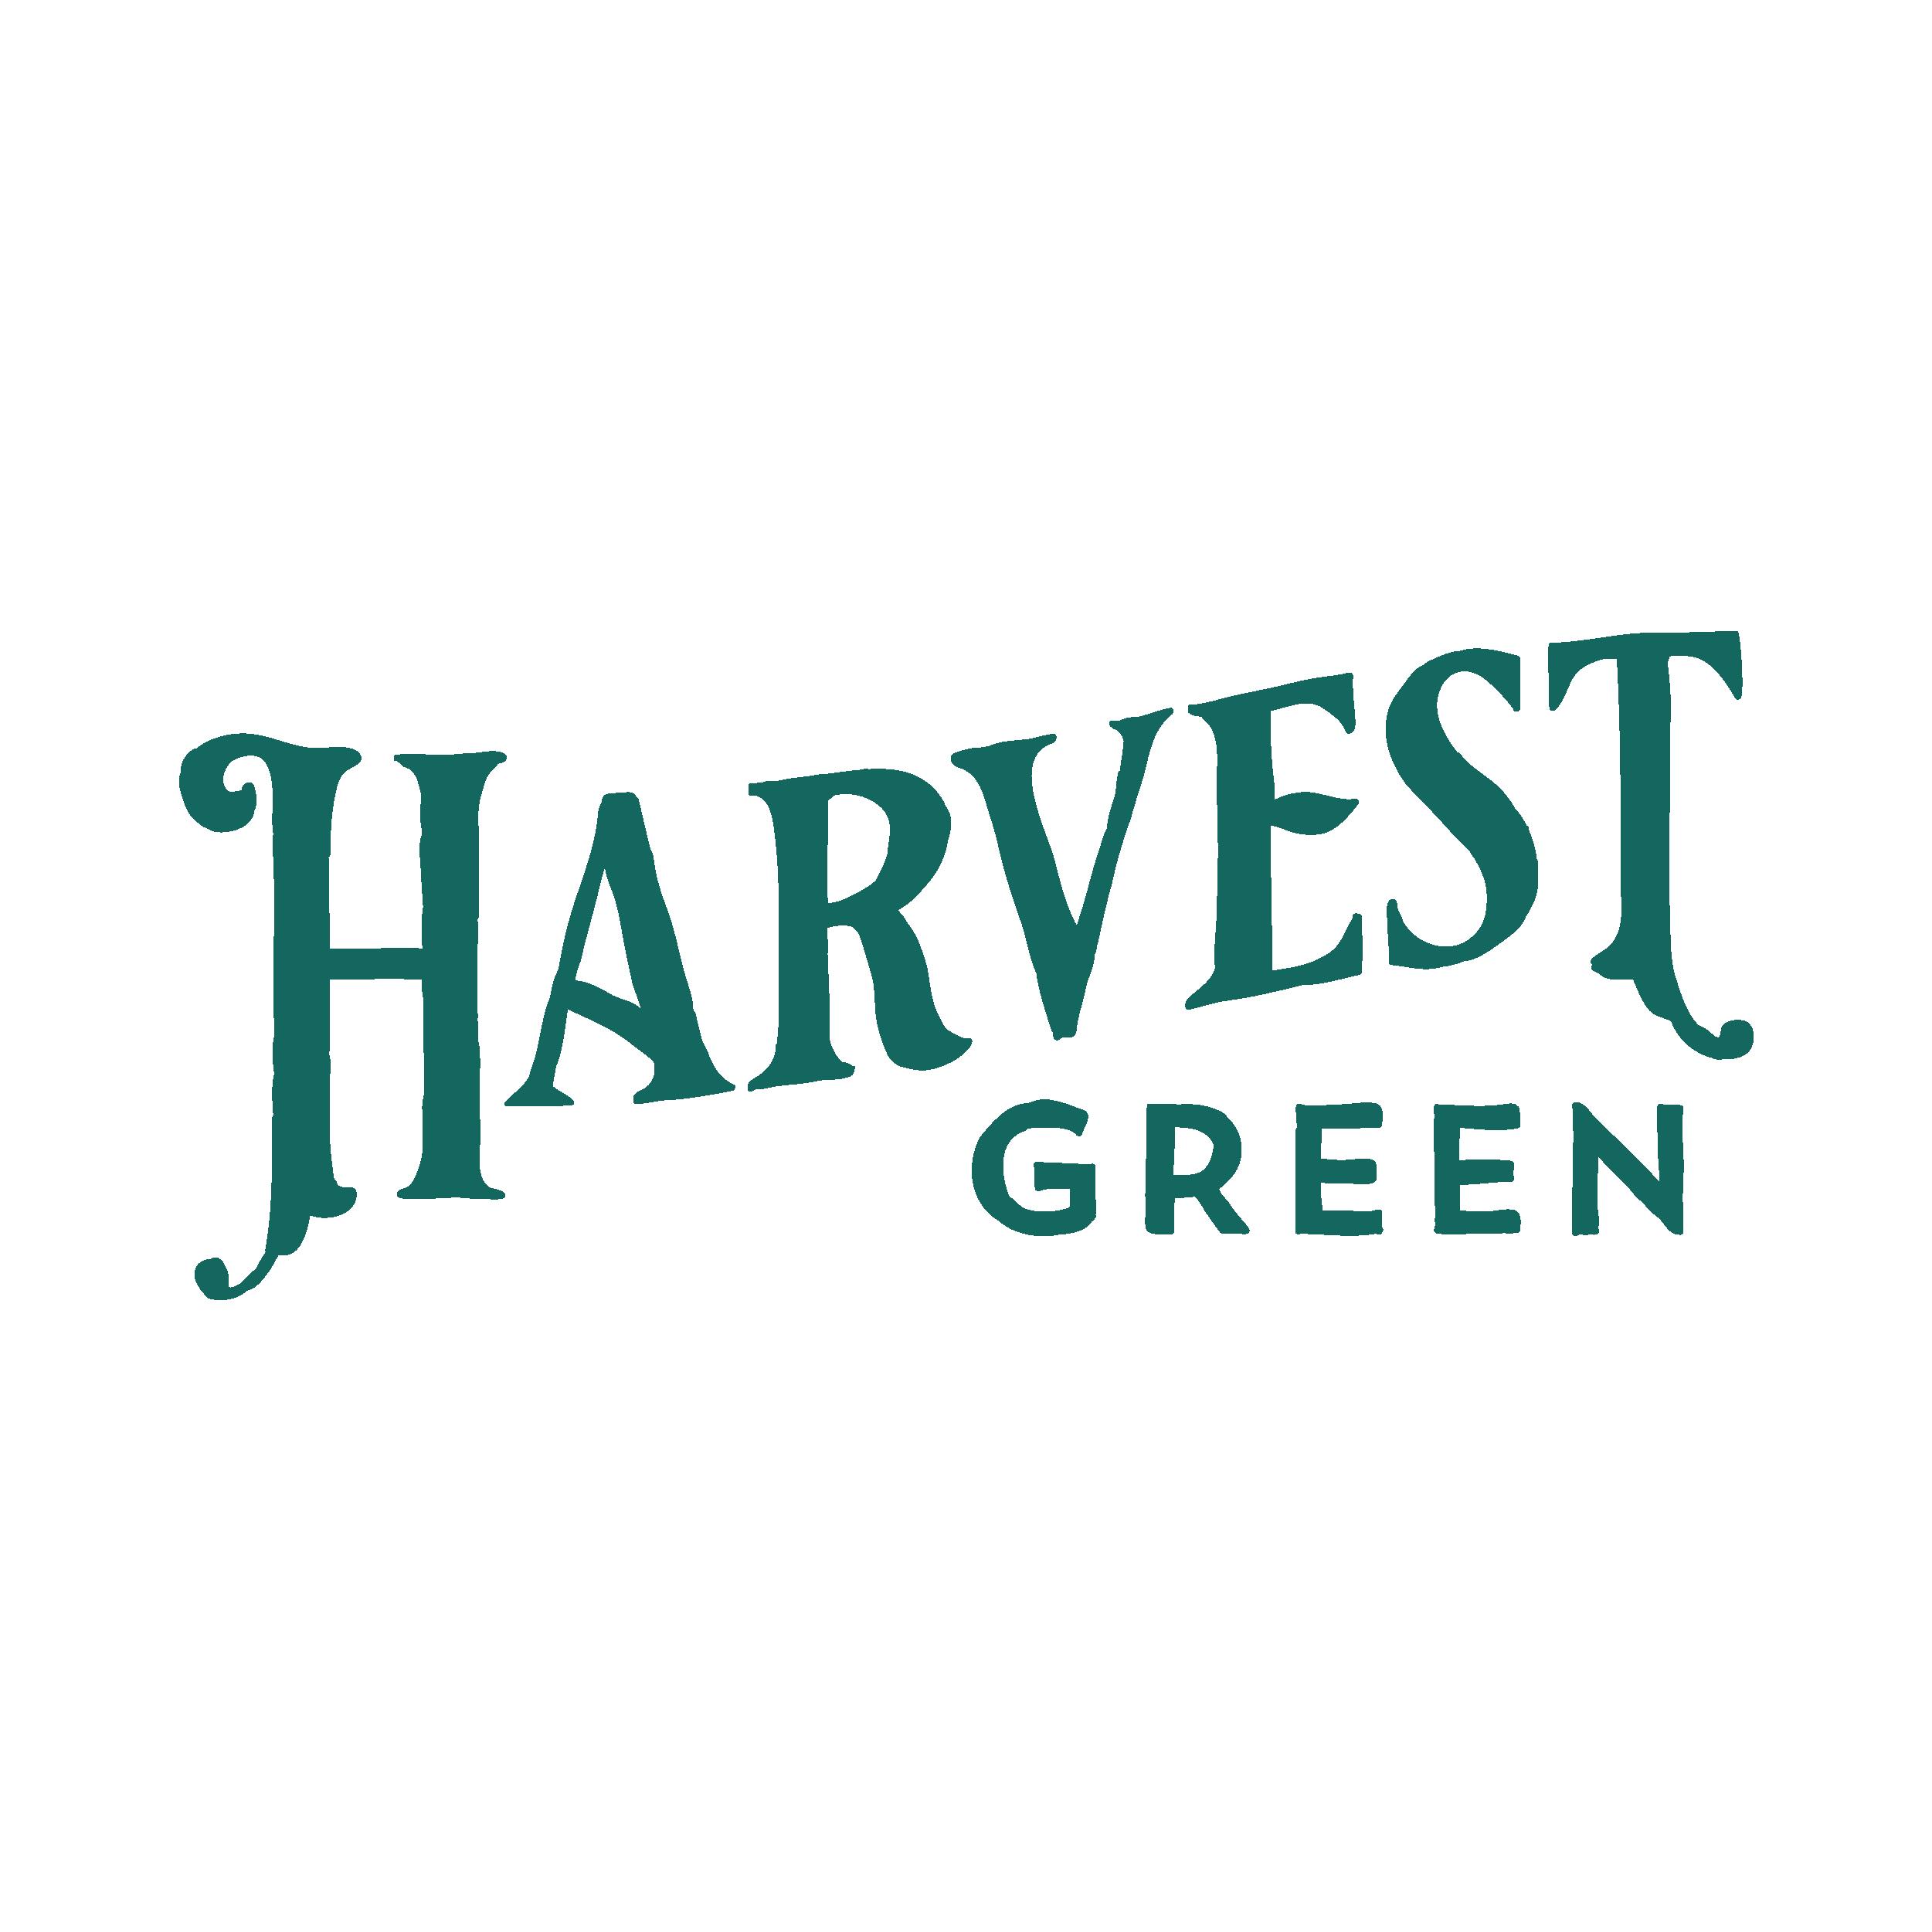 Harvestgreenfinal 04